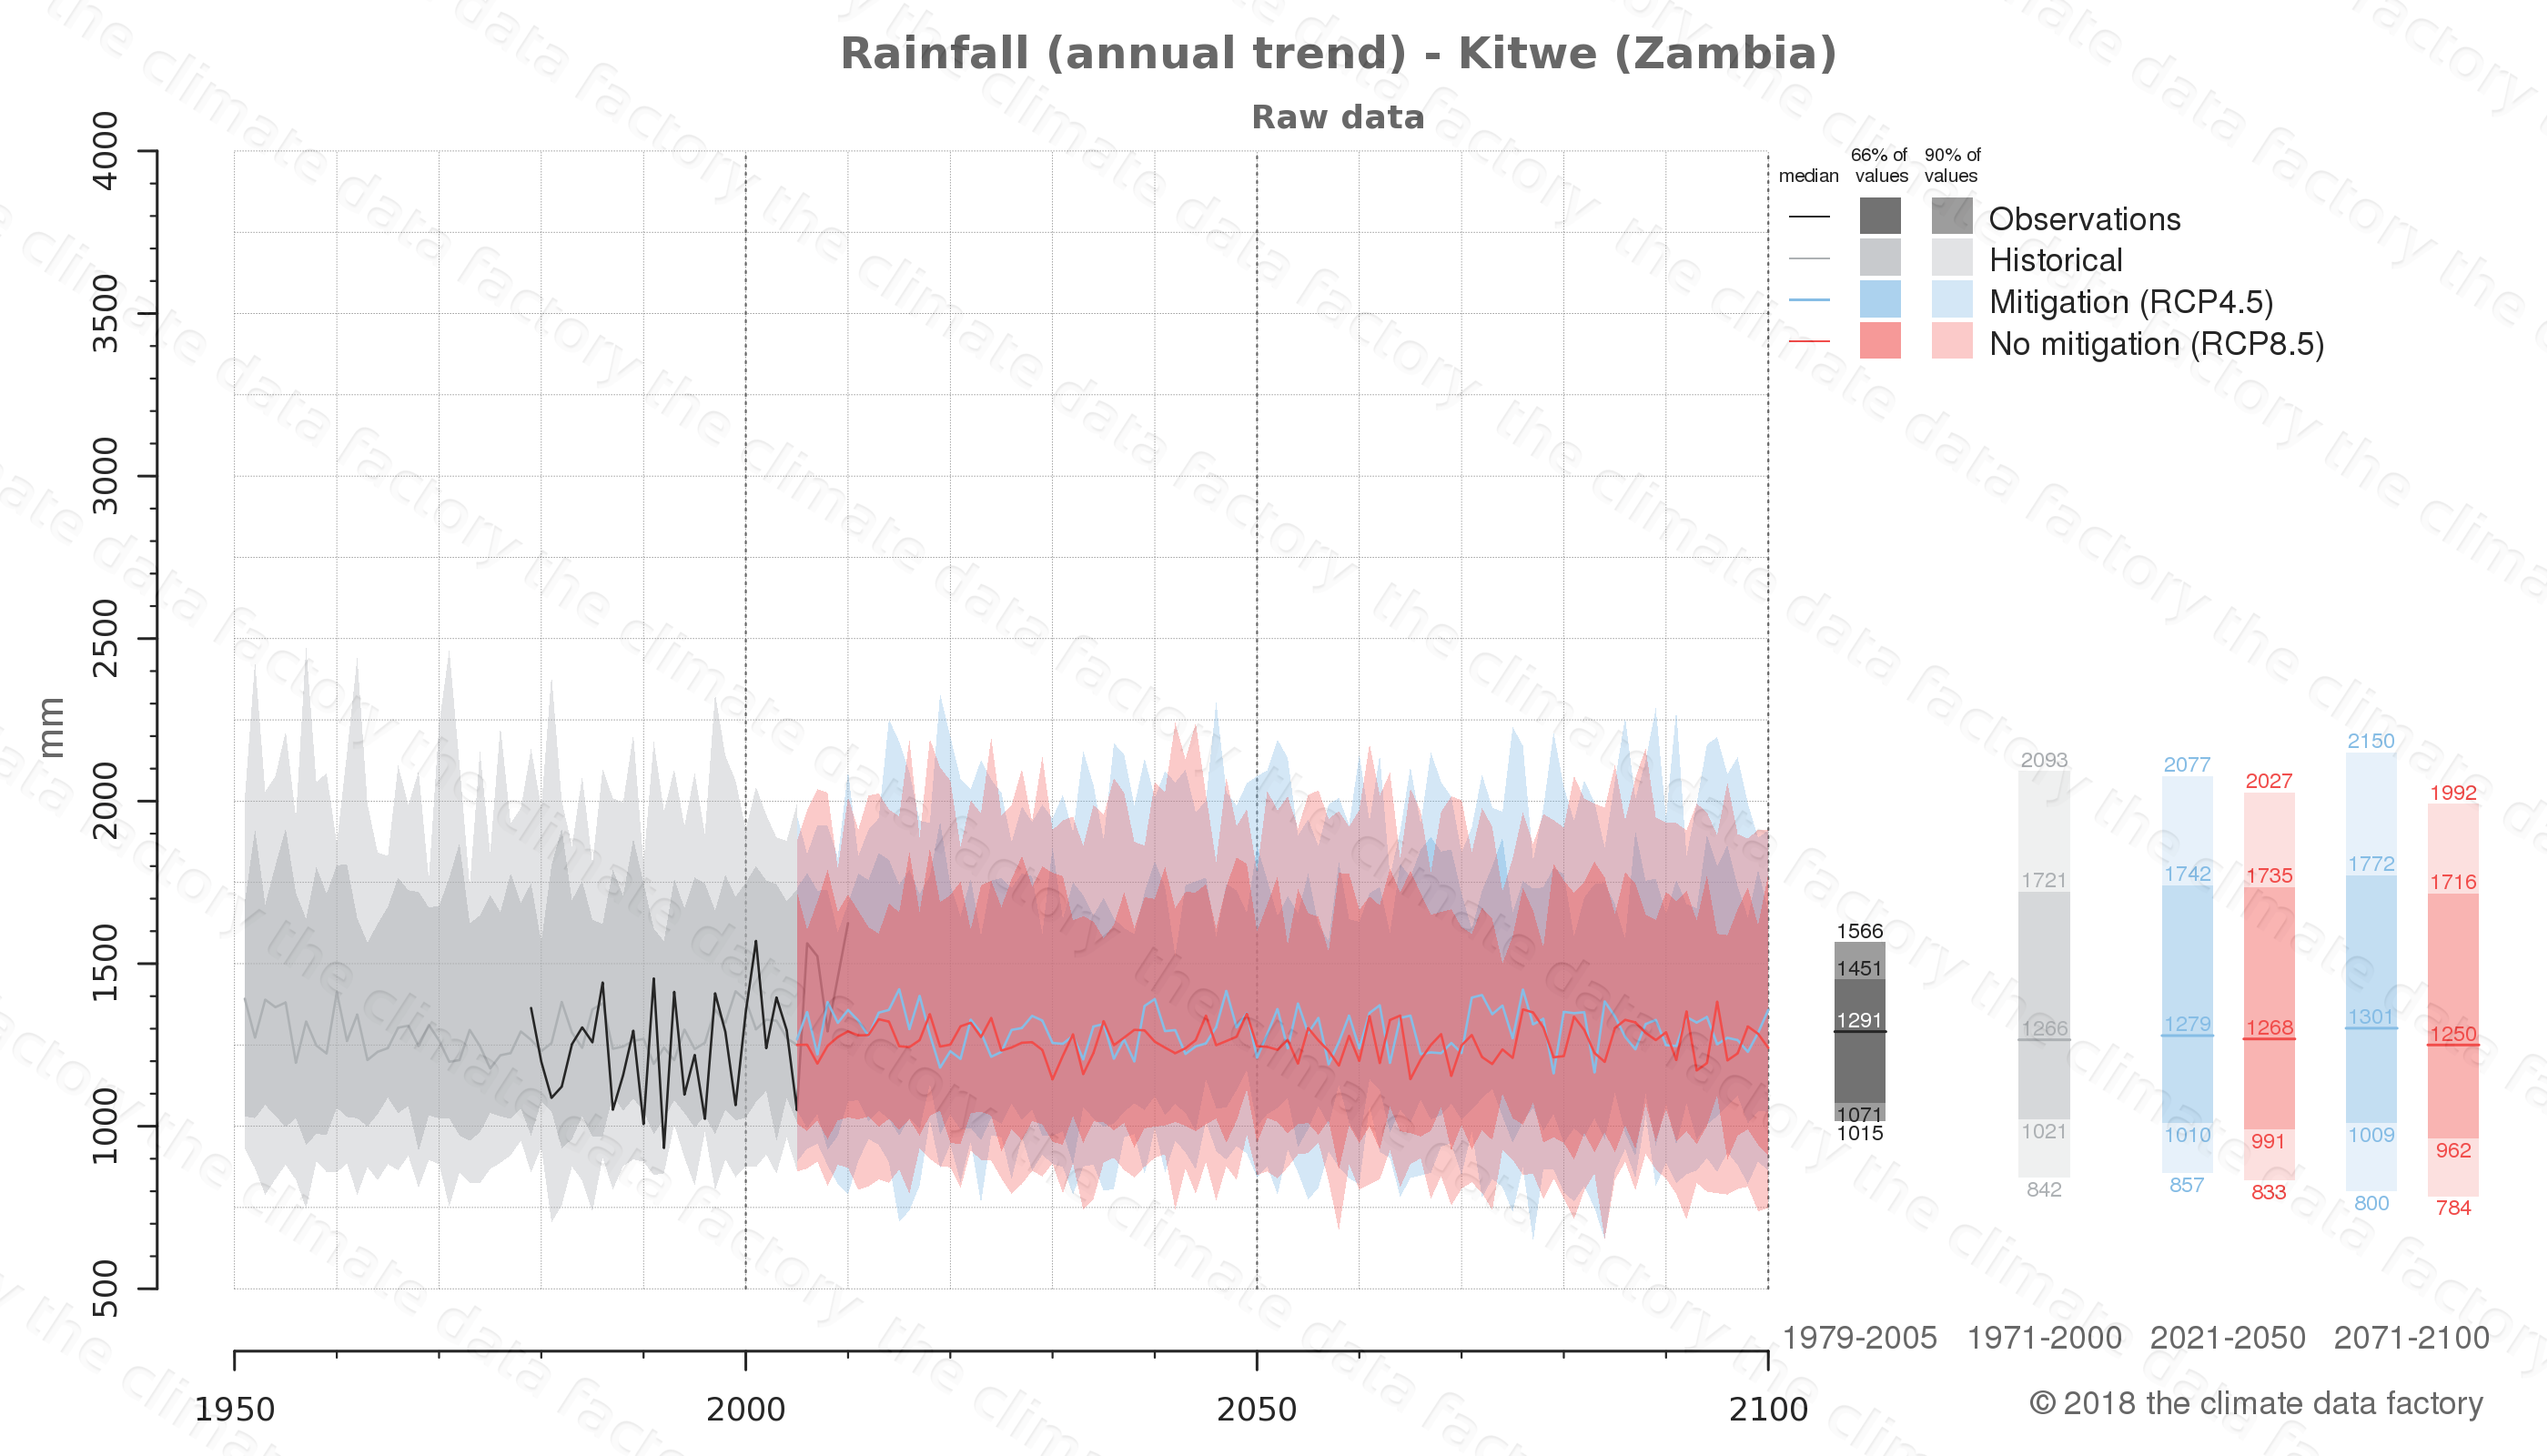 climate change data policy adaptation climate graph city data rainfall kitwe zambia